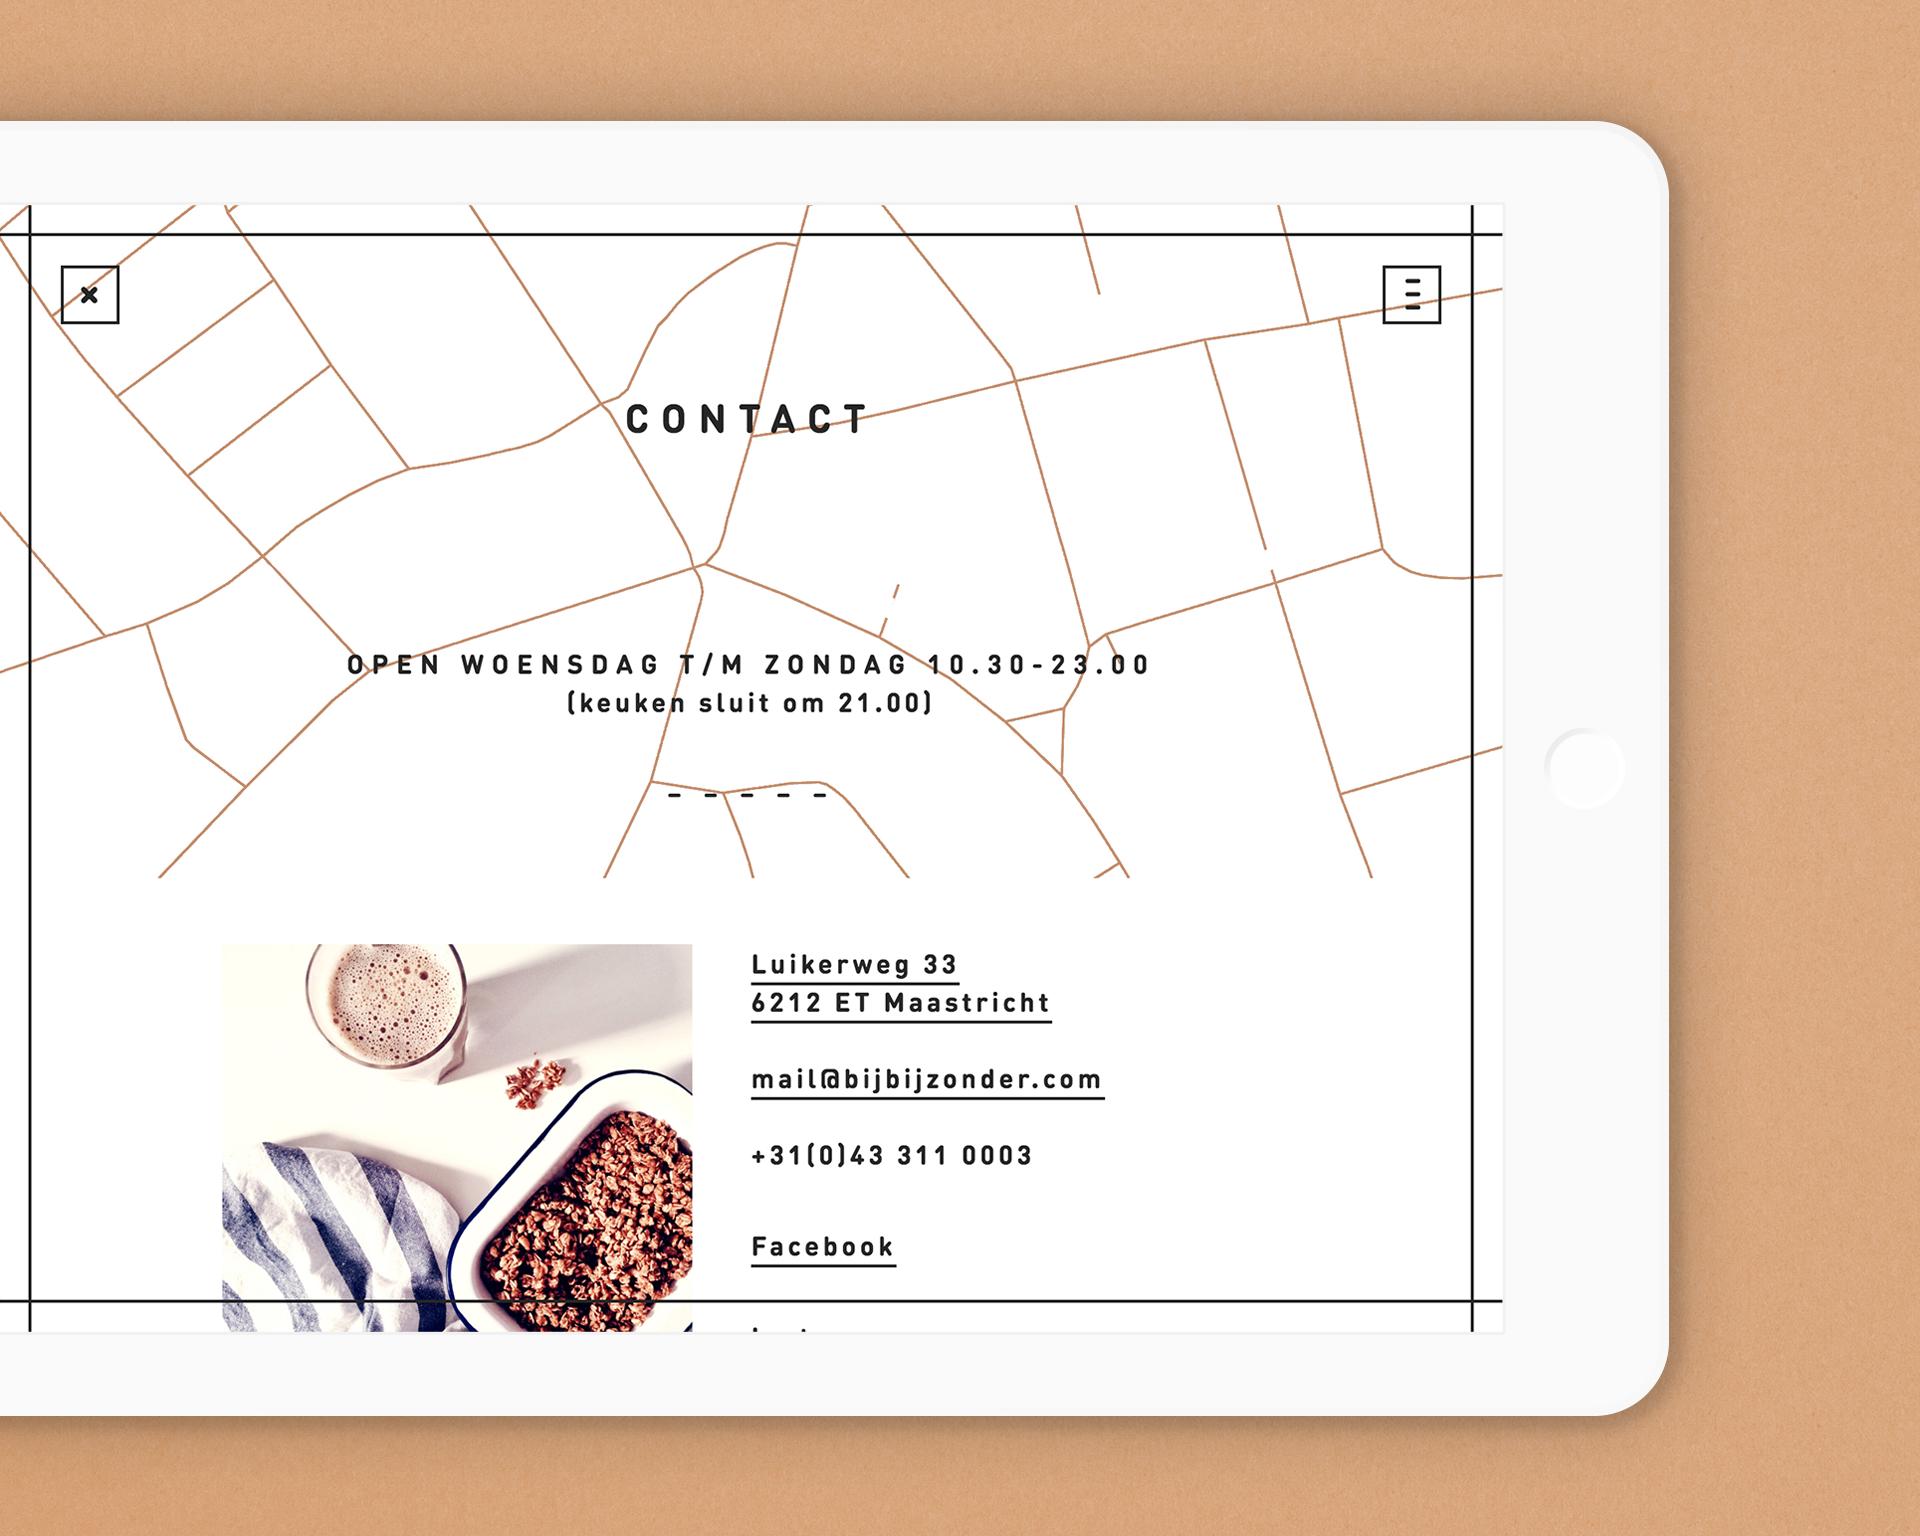 Bijzonder ipad resolution website designed by Saus in Maastricht